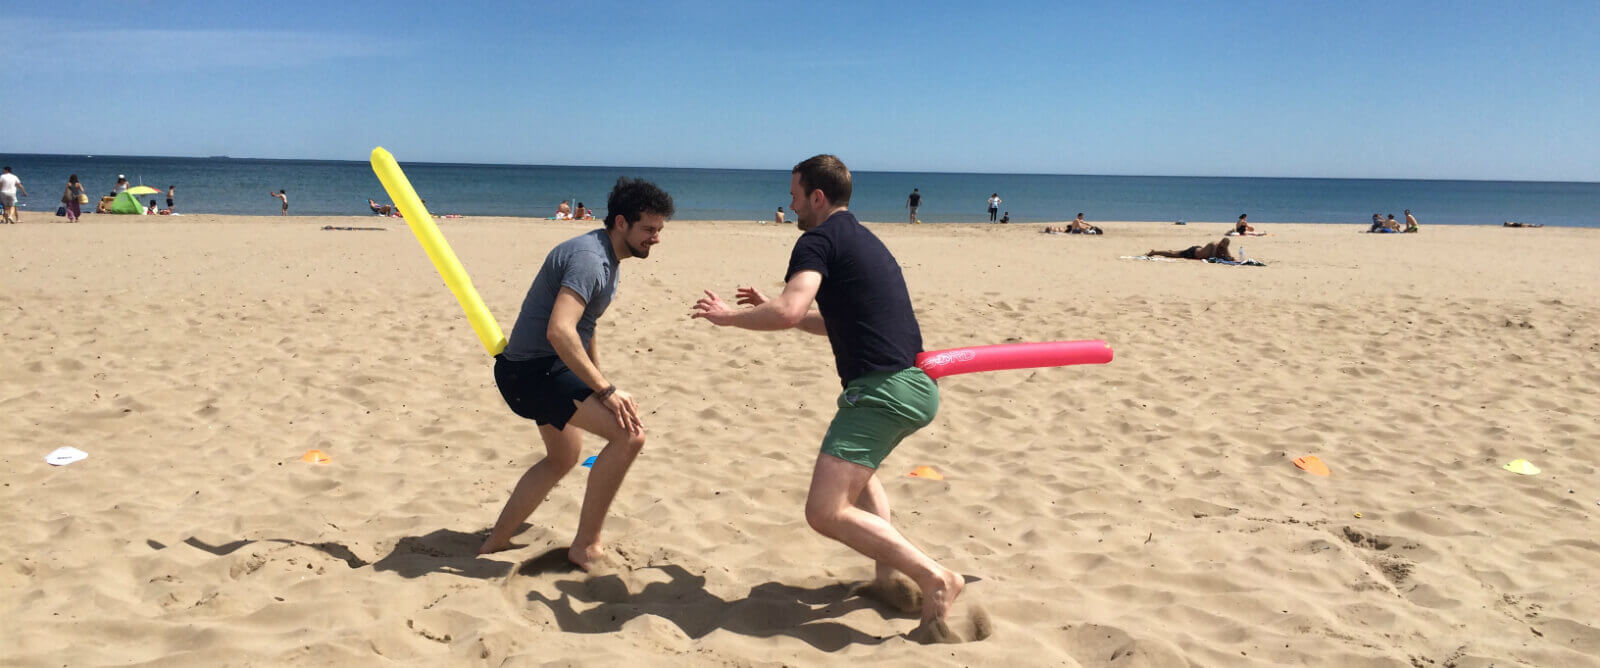 Corporate Team Building Beach Games